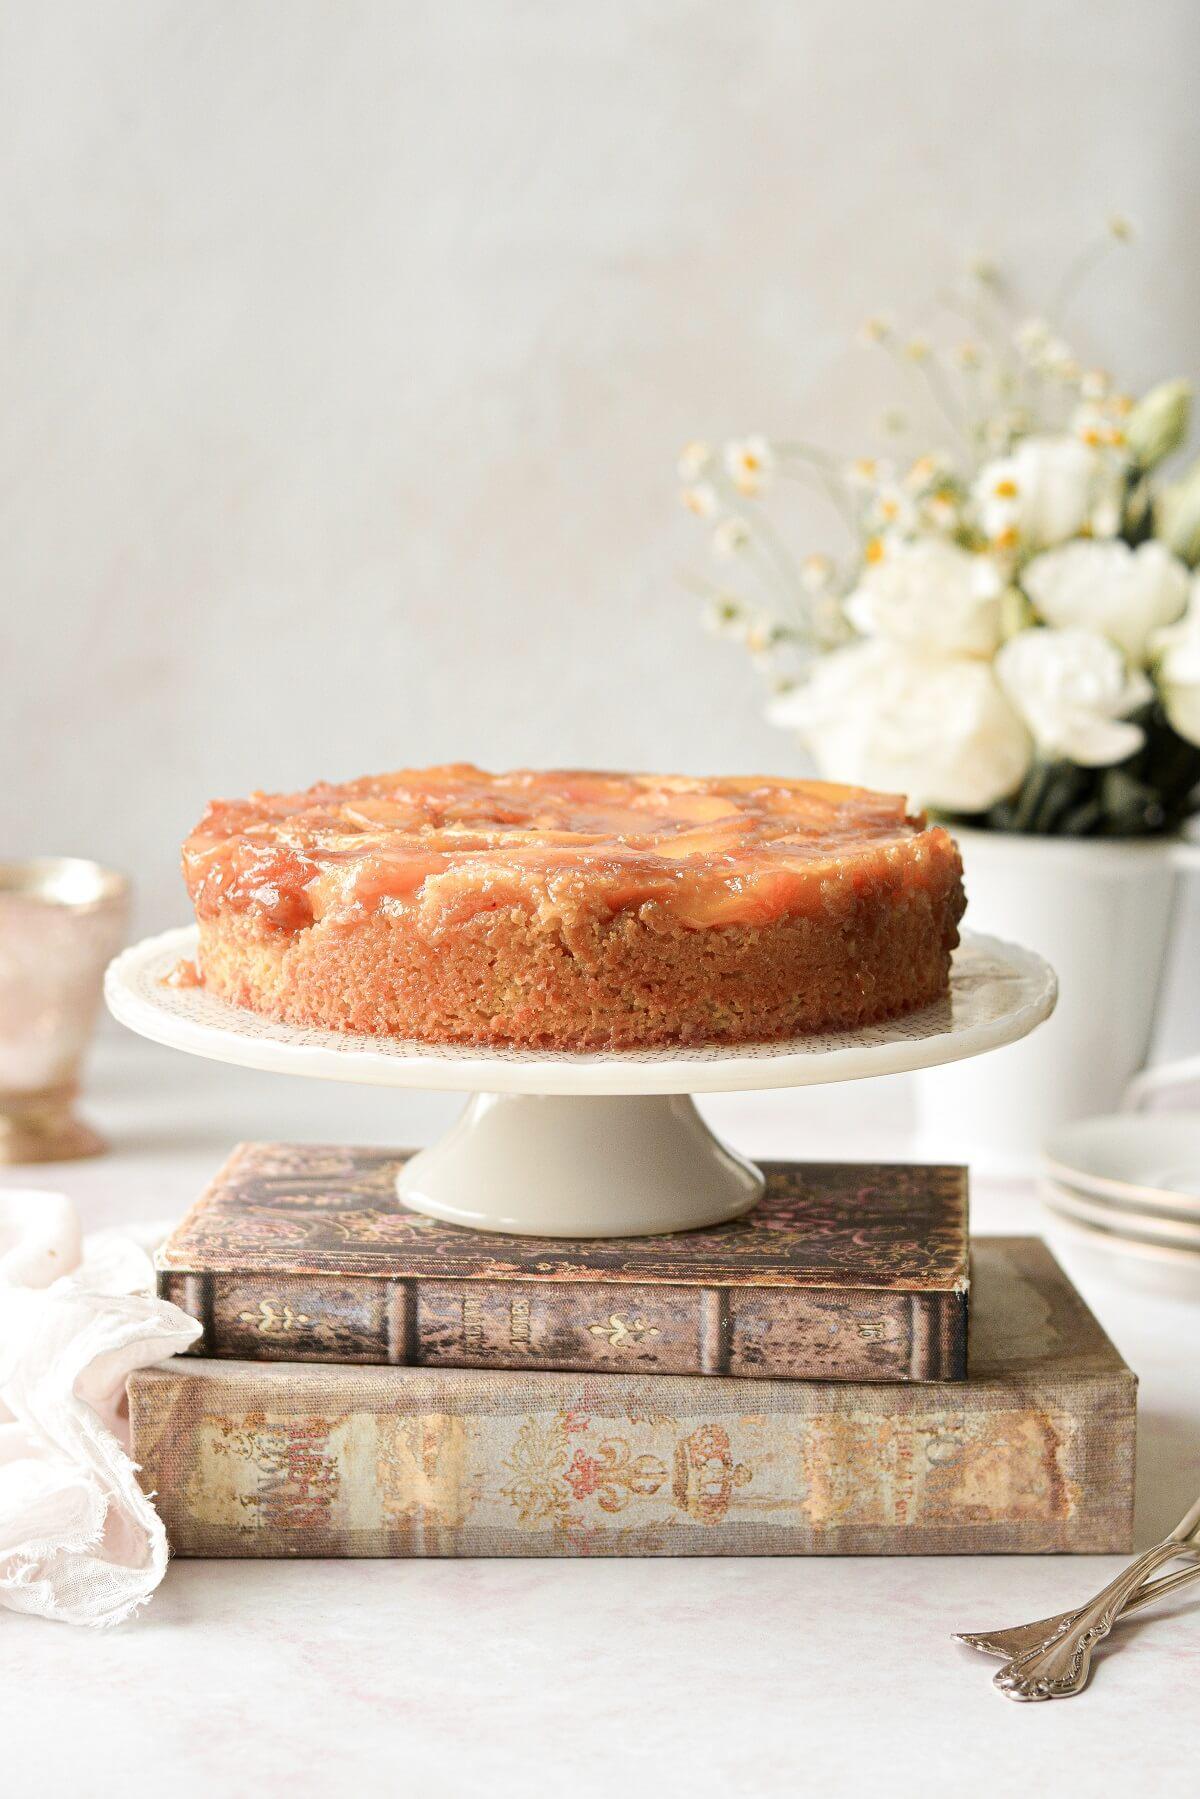 Peach upside down cake on a cake pedestal.